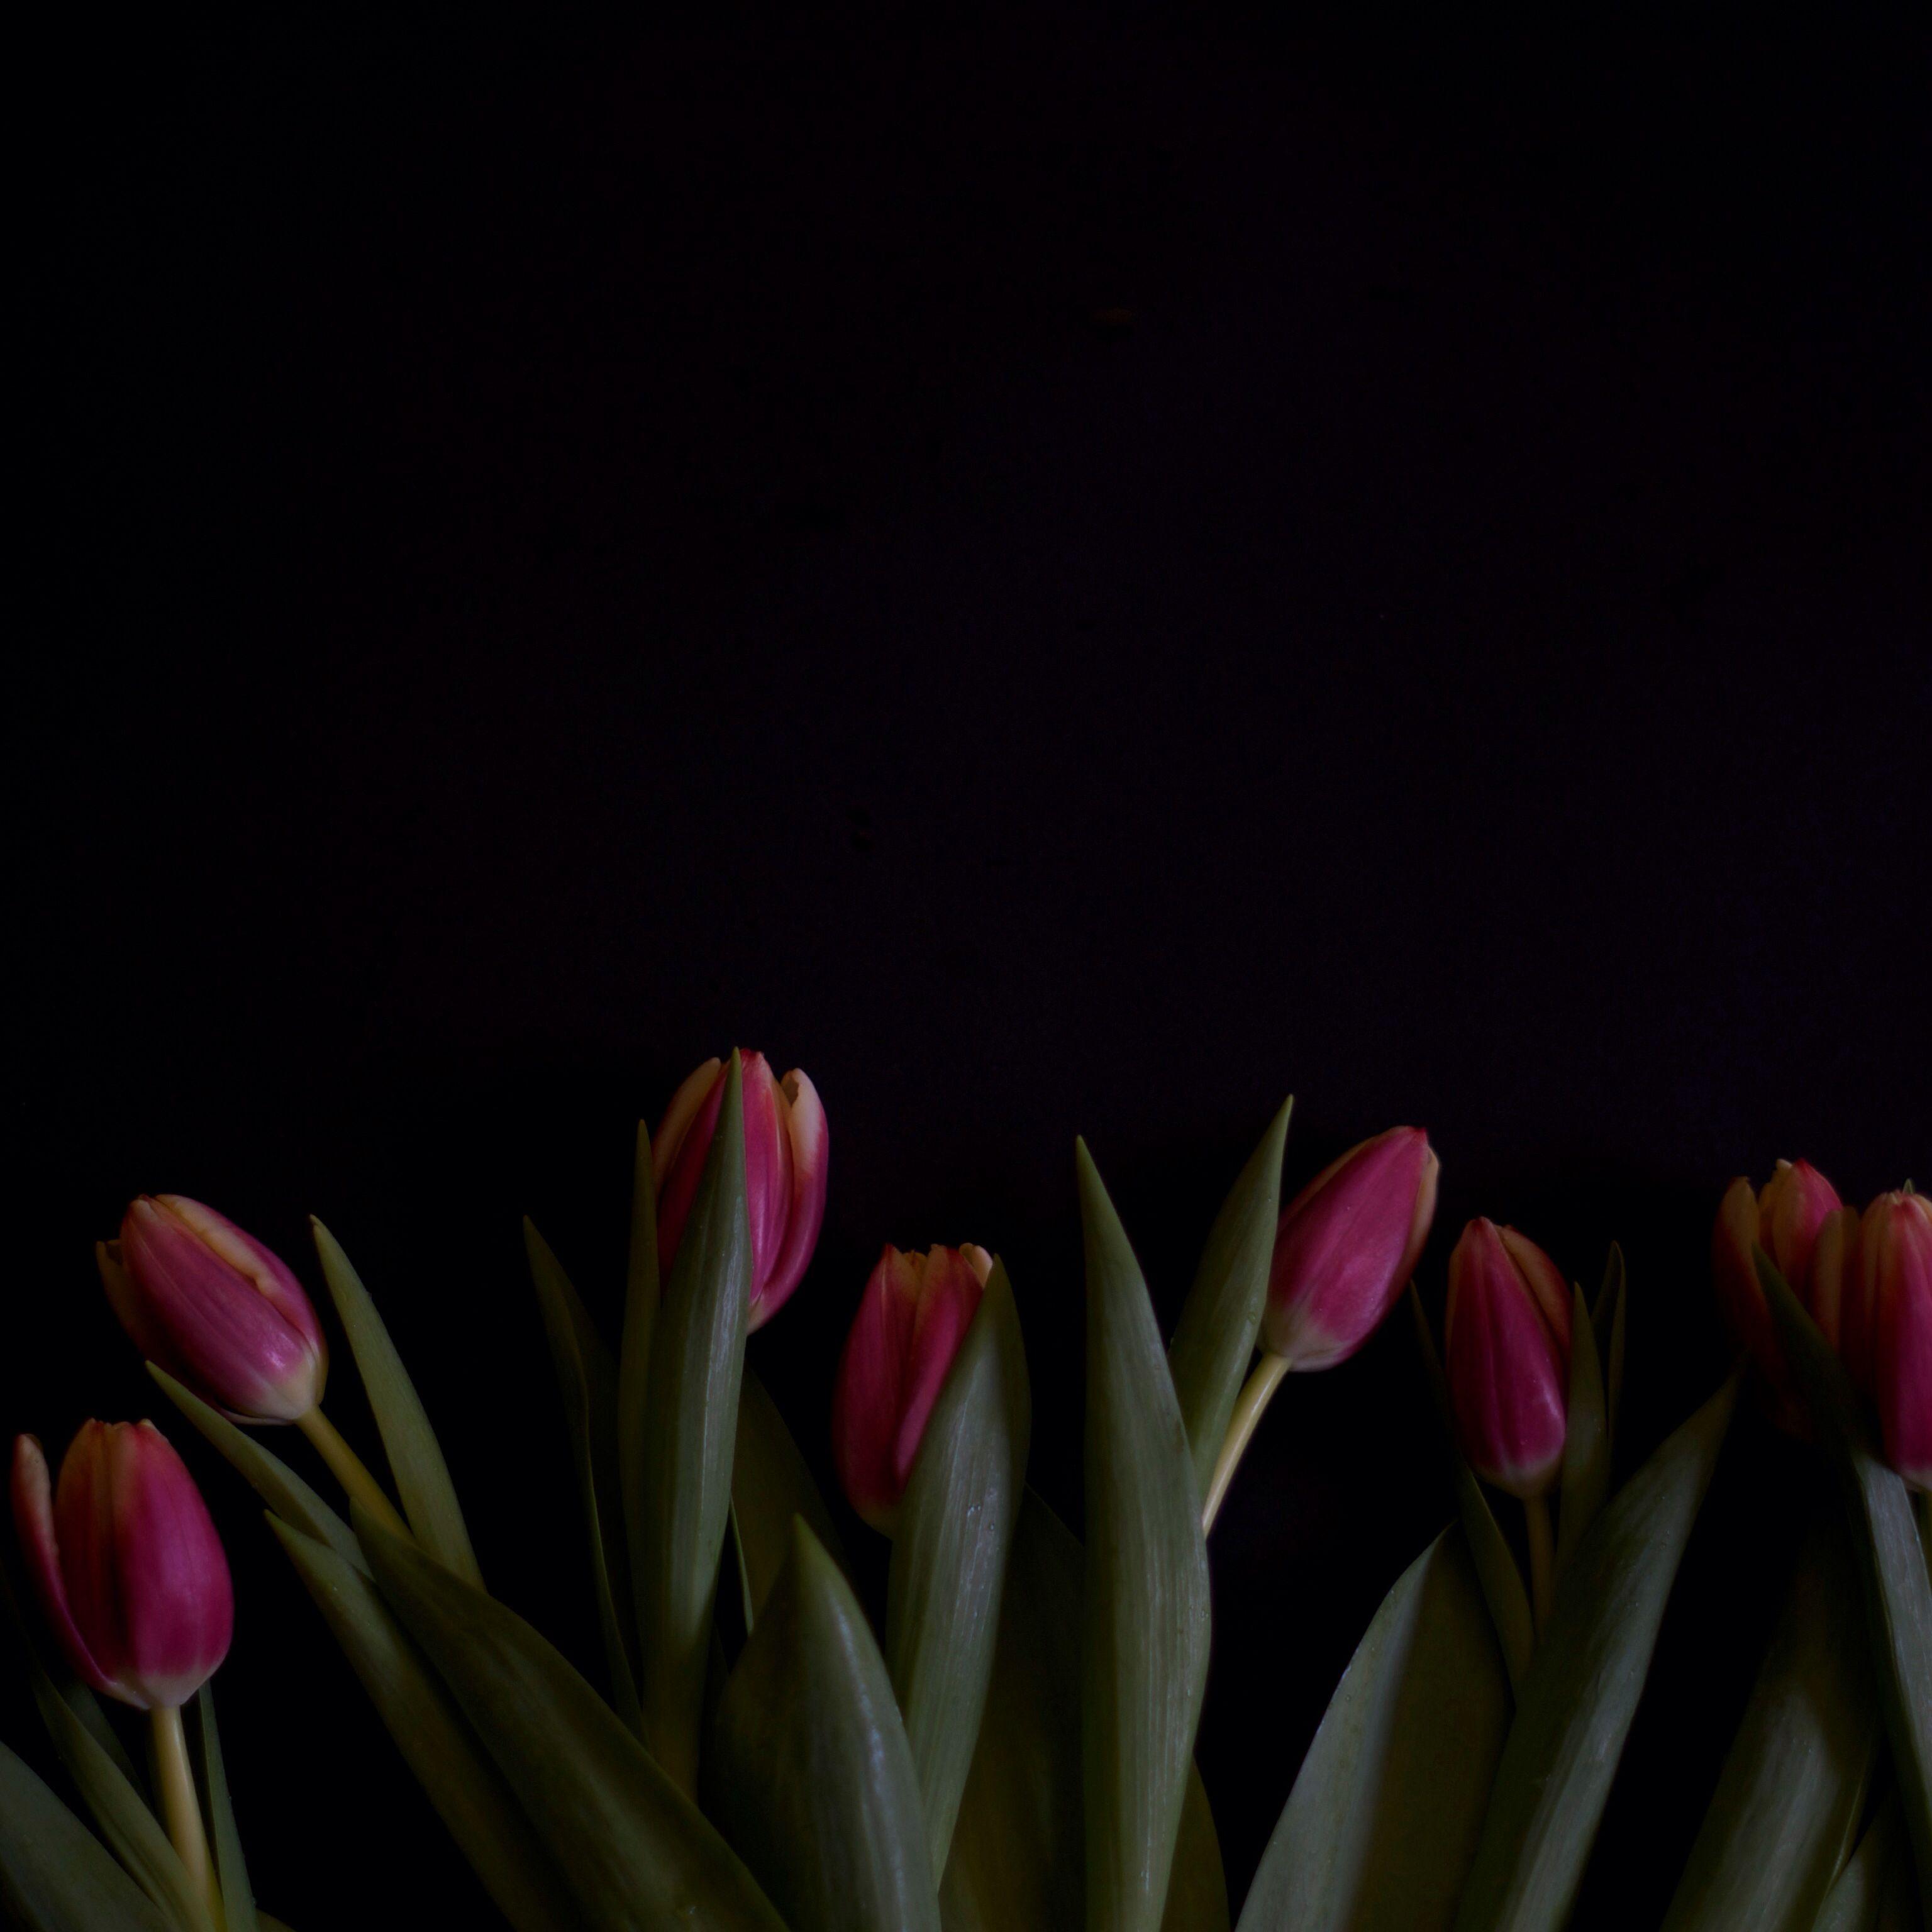 Pink tulips in the dark